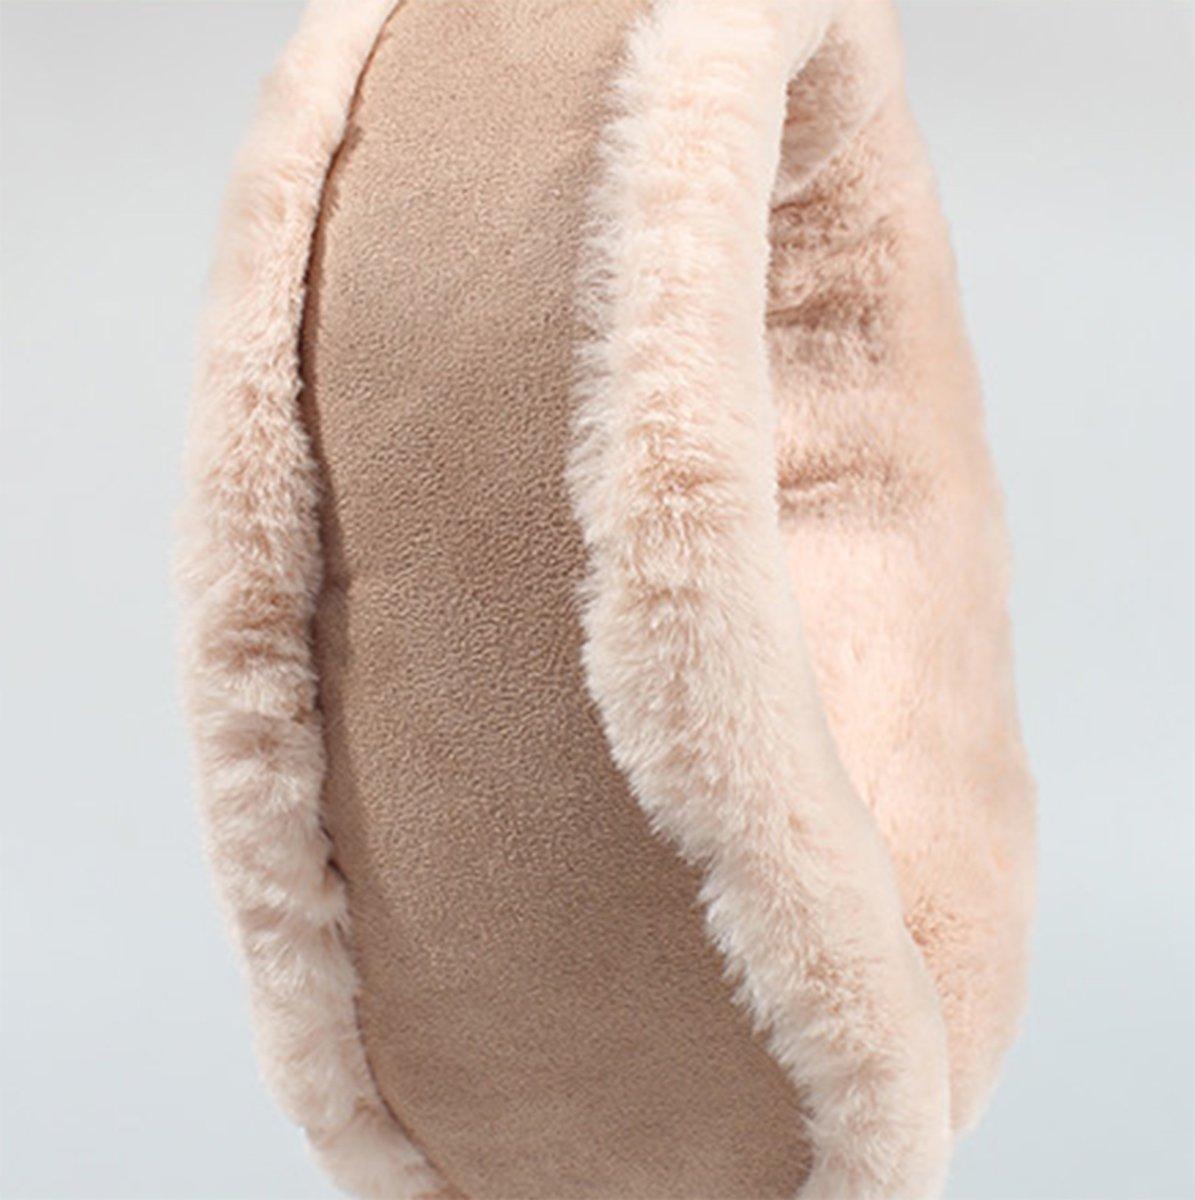 Knolee NEW Unisex Multi-function Earmuffs Earflap Foldable Outdoor Ear Muffs,Beige One Size by Knolee (Image #4)